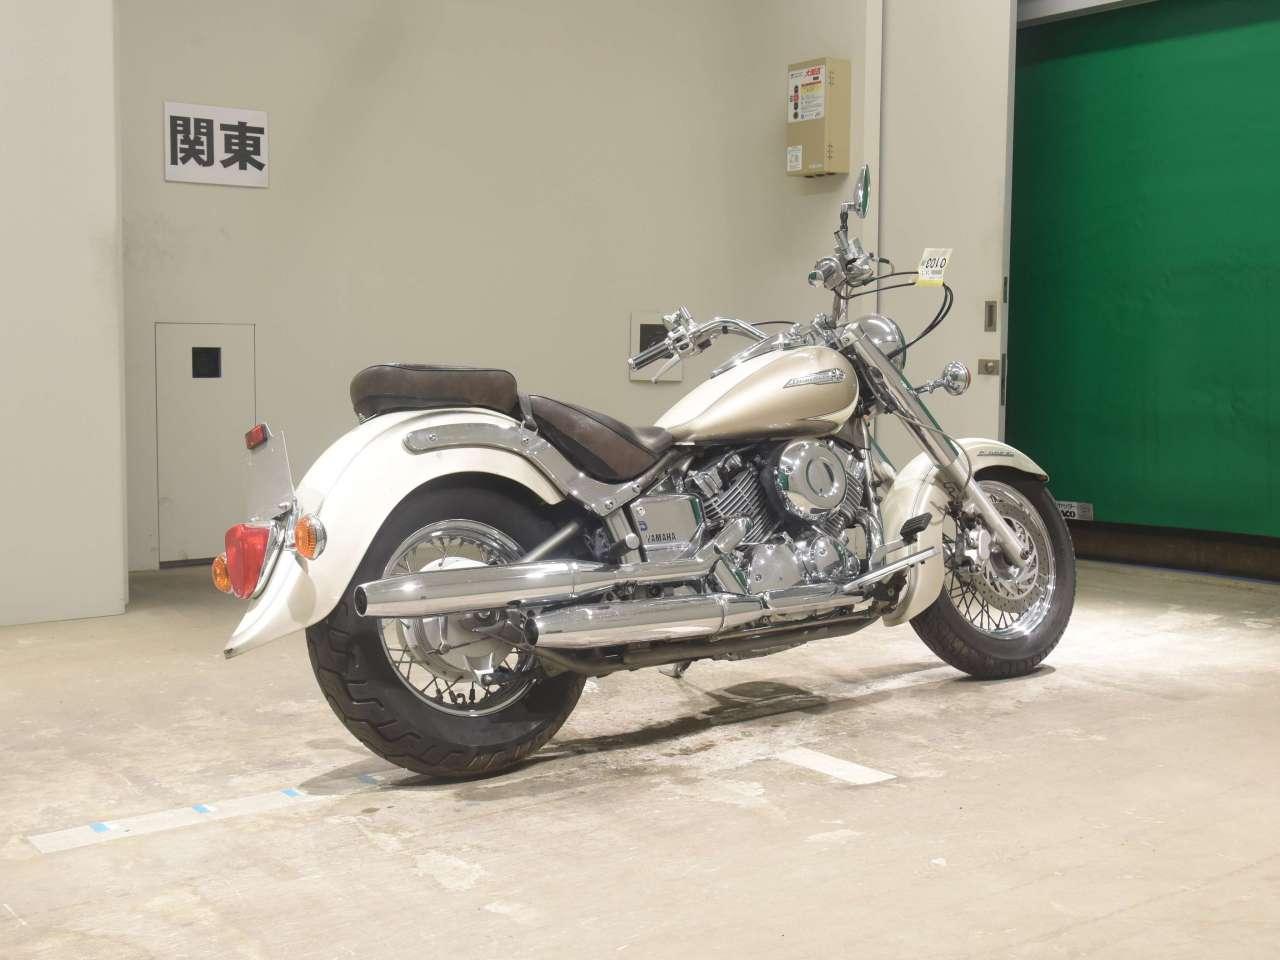 МОТОЦИКЛ YAMAHA DRAG STAR 400 Classic 2008  Артмото - купить квадроцикл в украине и харькове, мотоцикл, снегоход, скутер, мопед, электромобиль